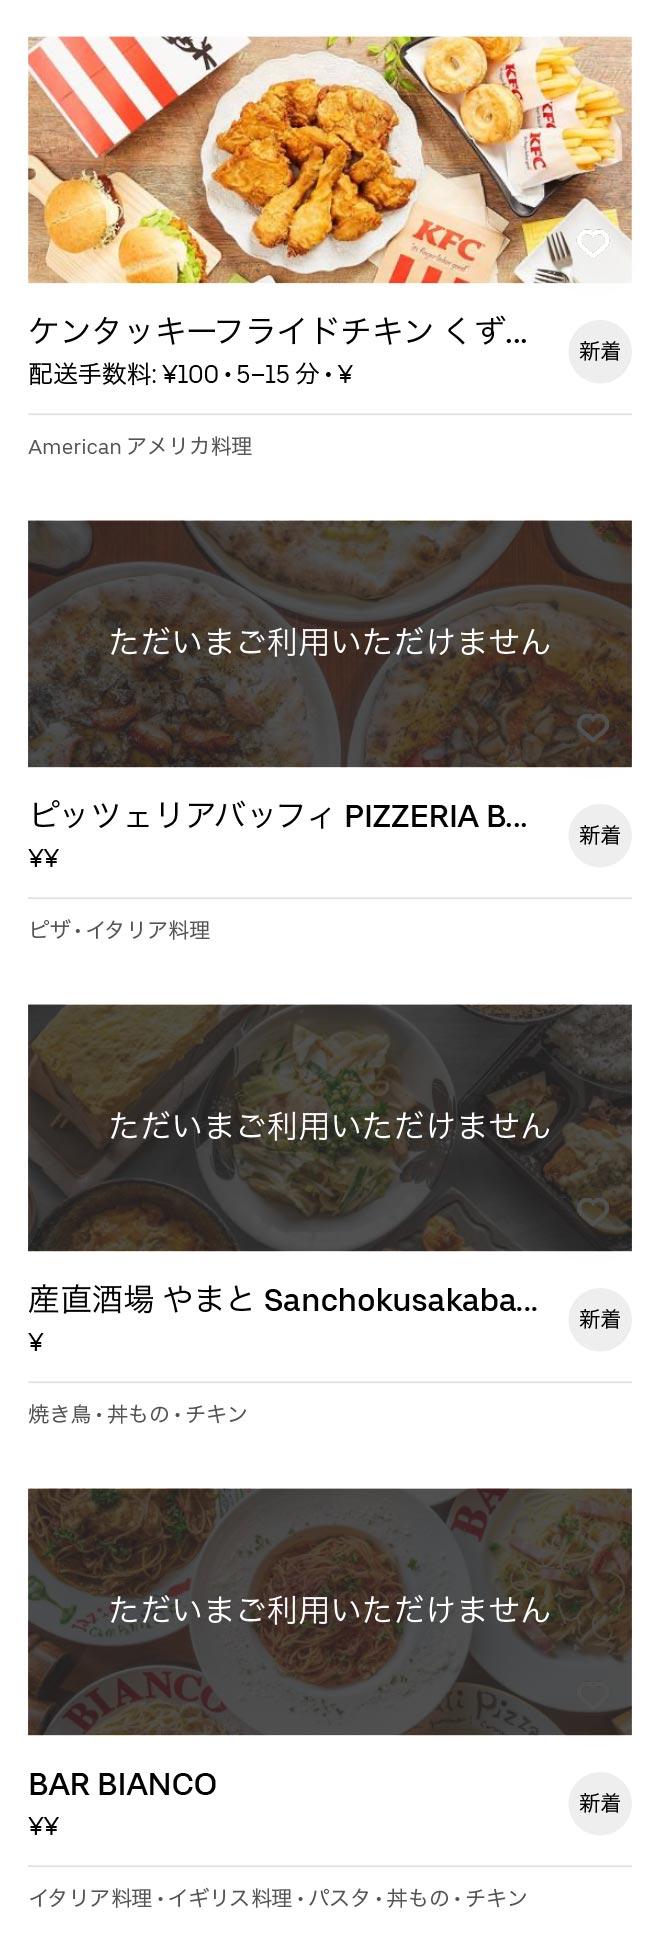 Hirakata kuzuha menu 2005 03